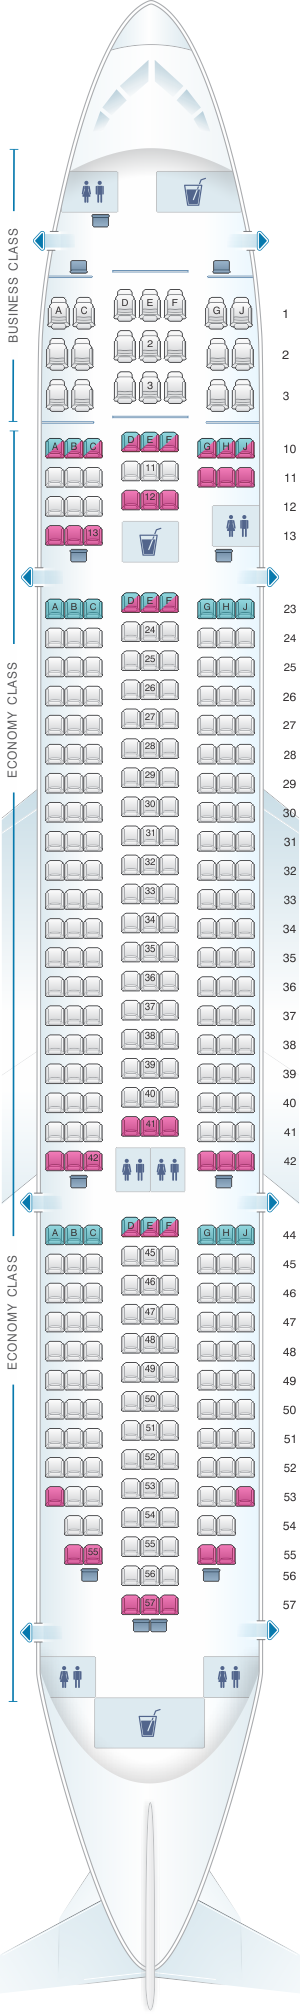 Seat map for Jetstar Airways Boeing 787-8 Dreamliner